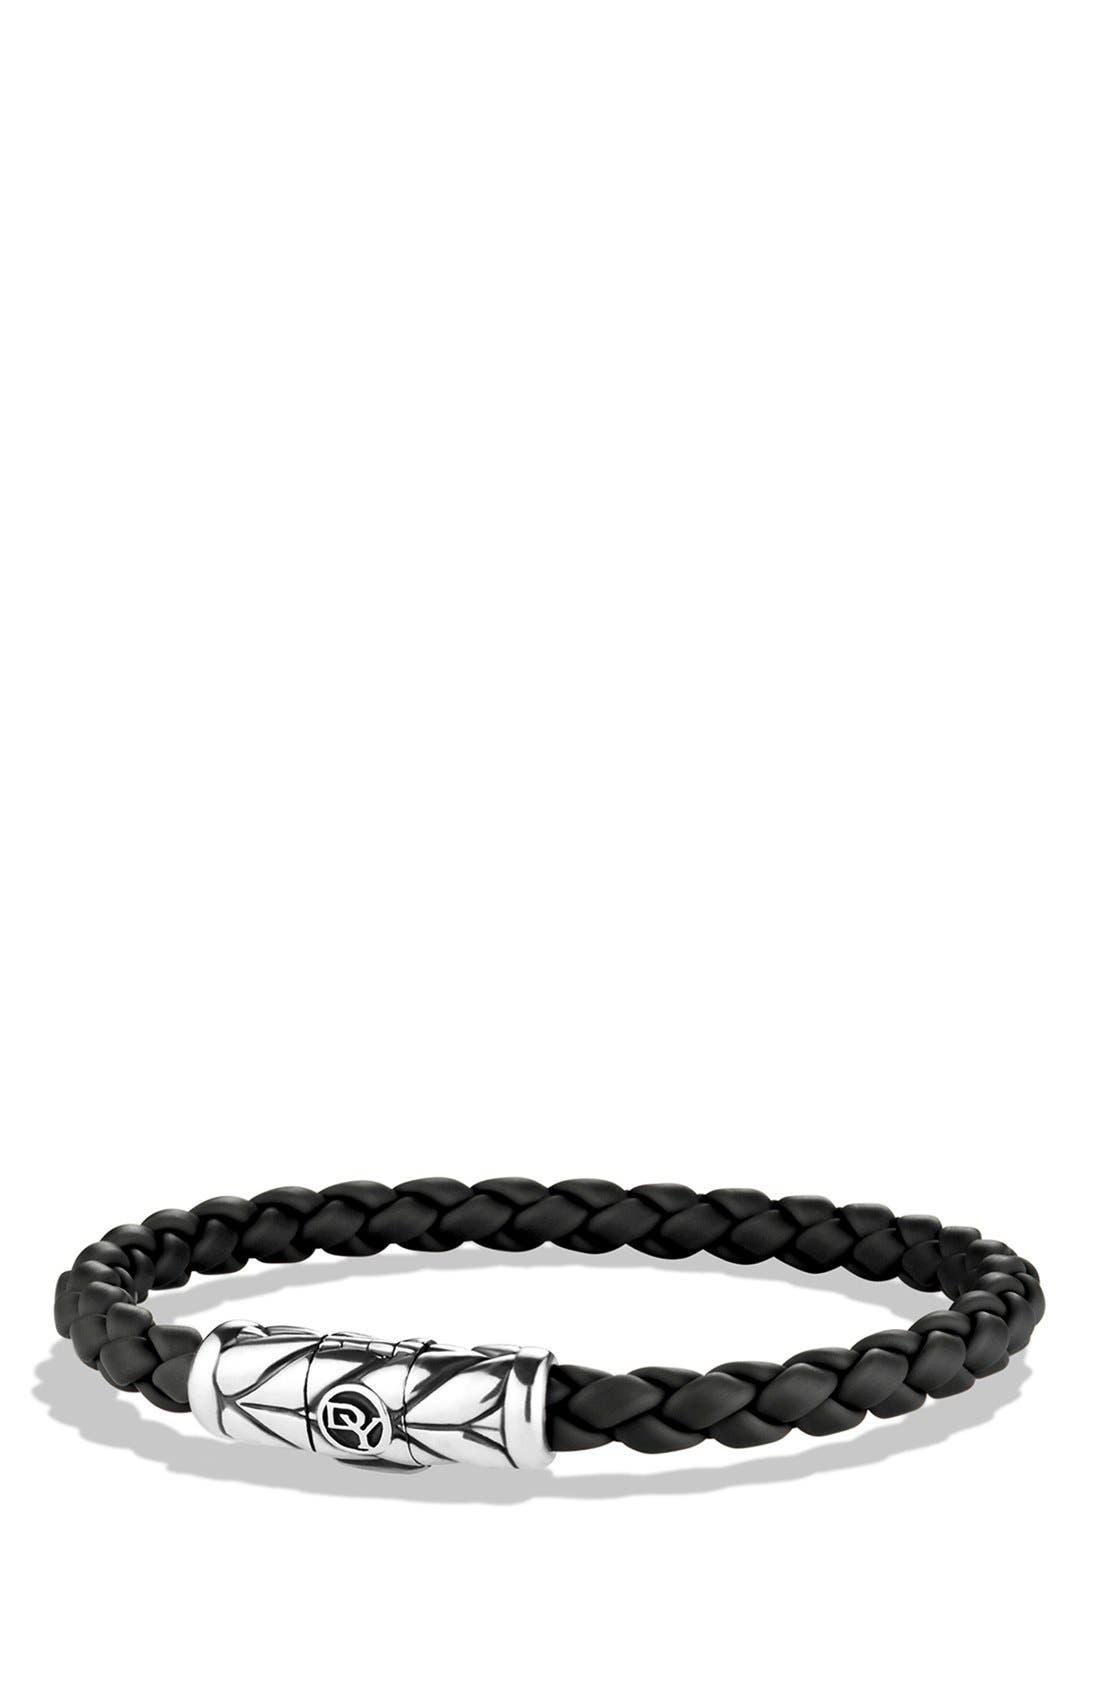 DAVID YURMAN 'Chevron' Woven Rubber Bracelet, Main, color, BLACK